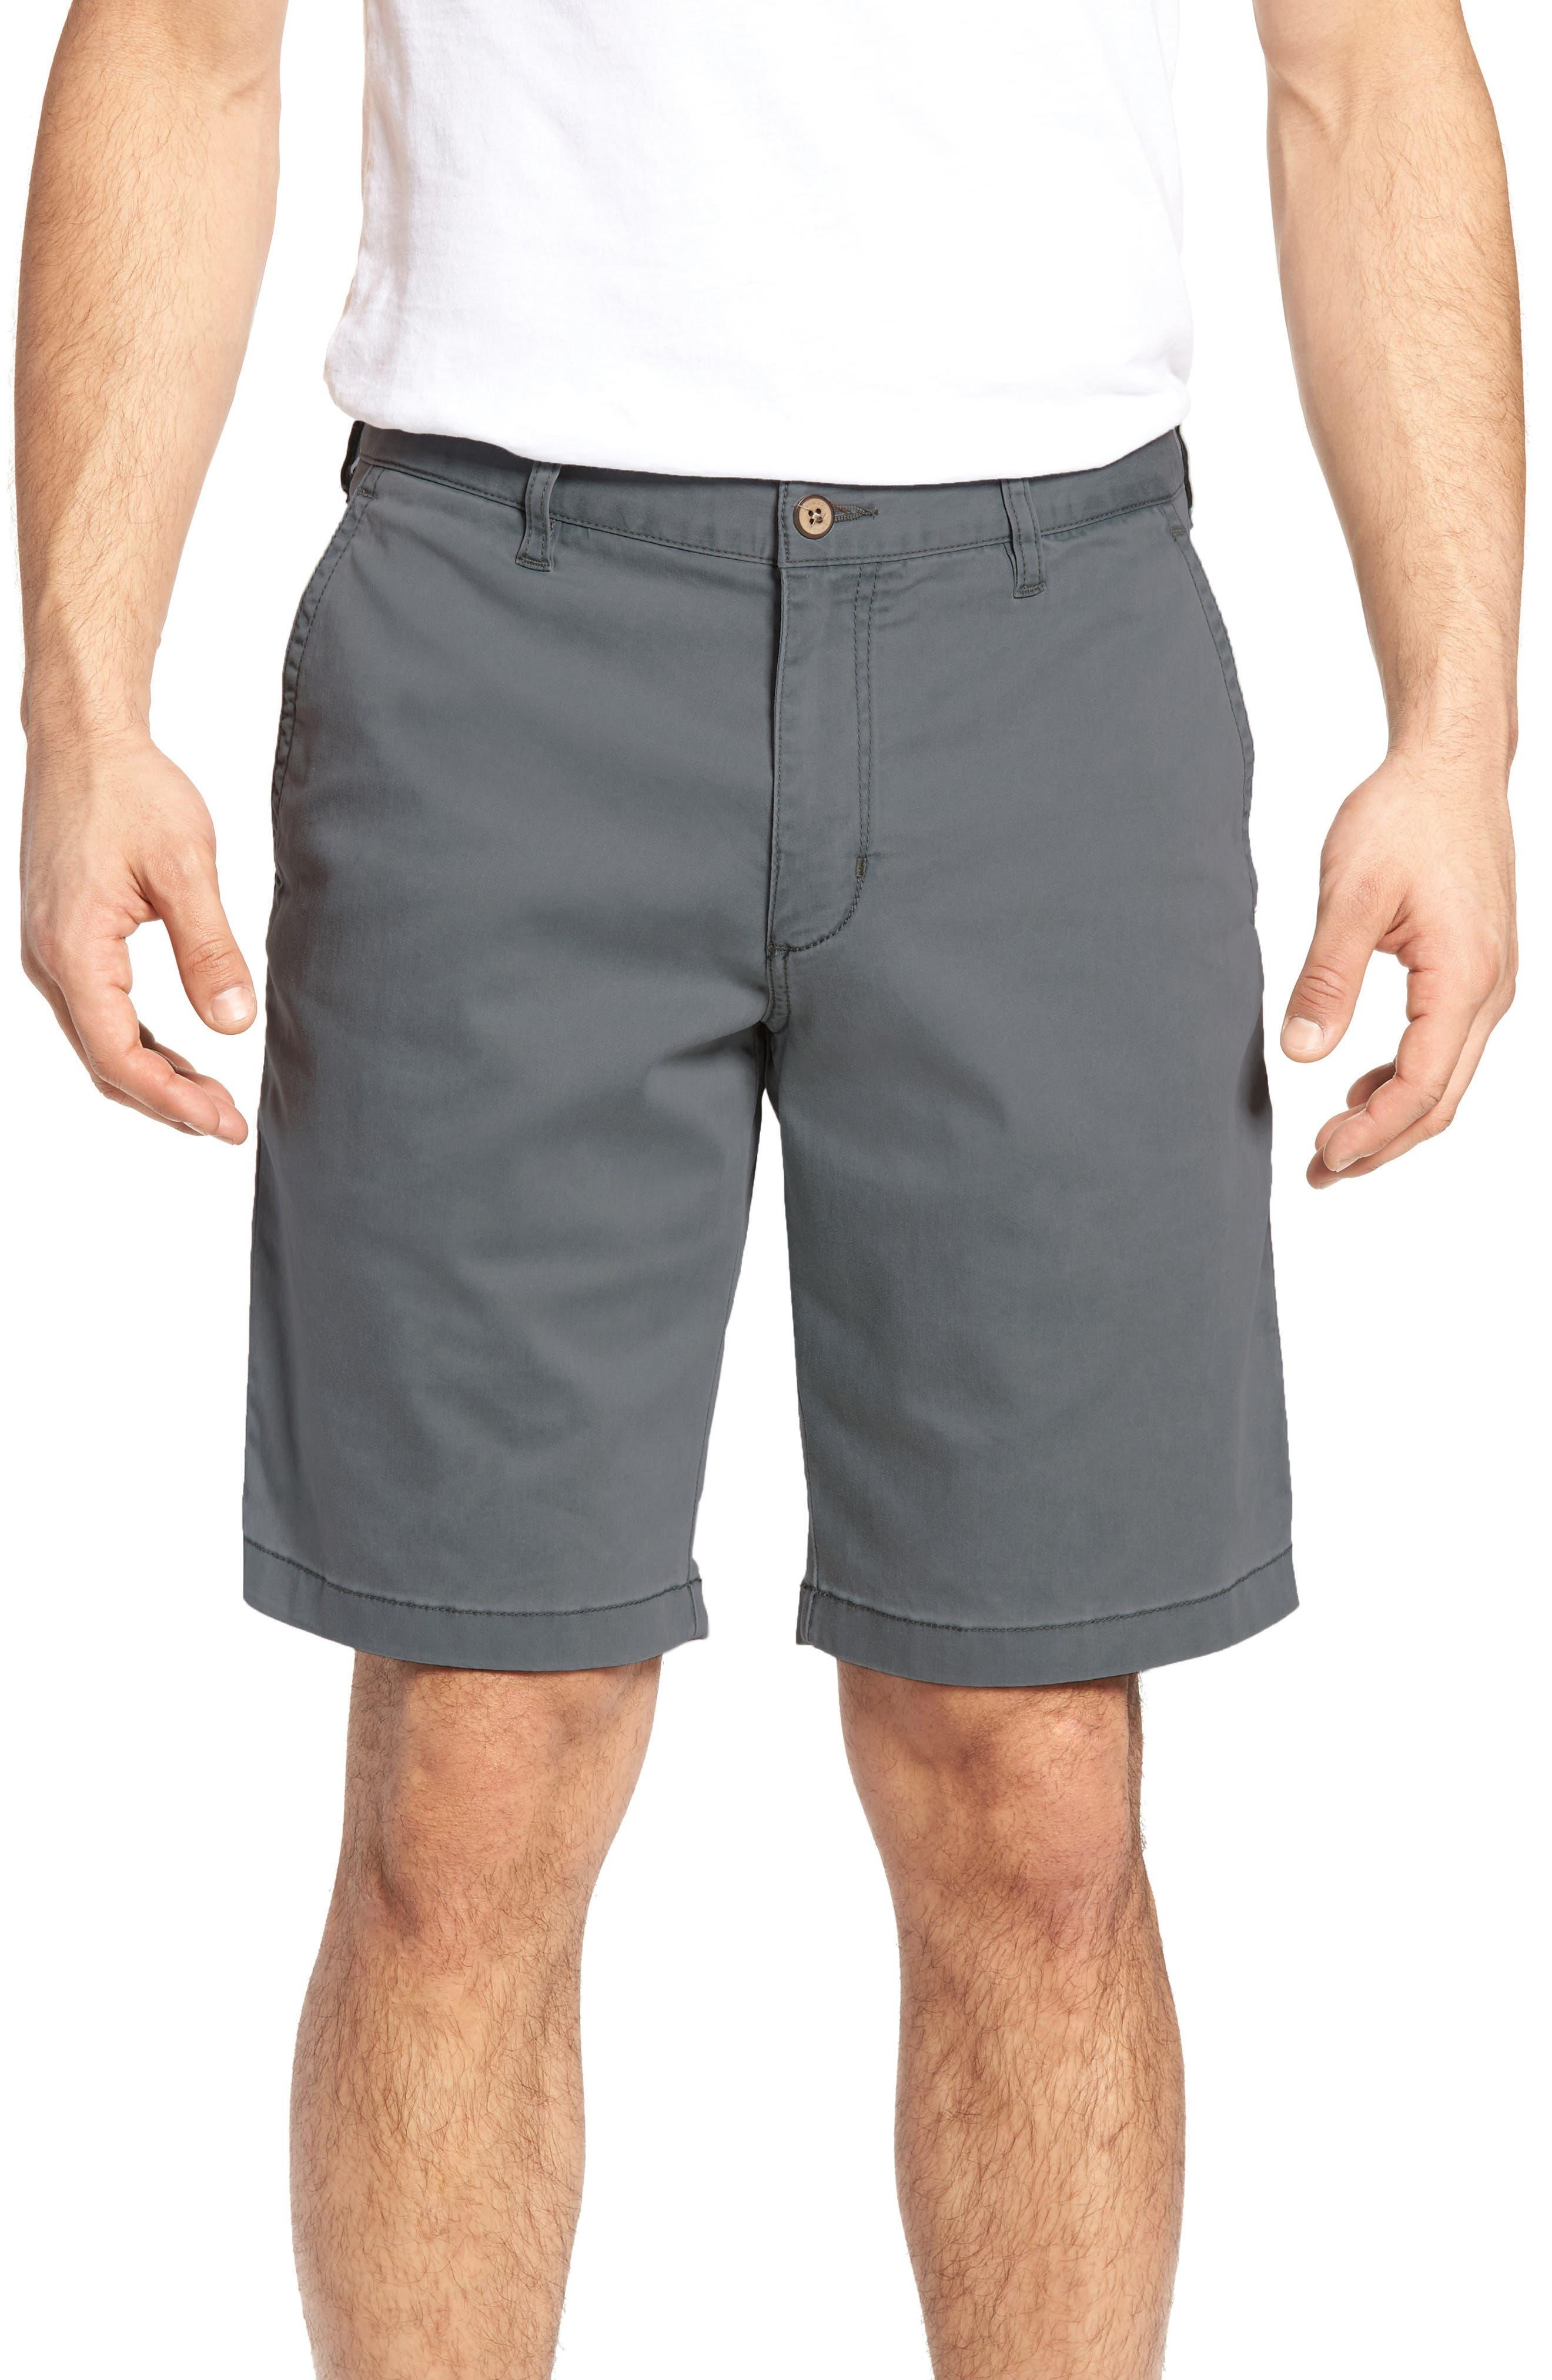 Boracay Chino Shorts,                             Main thumbnail 6, color,